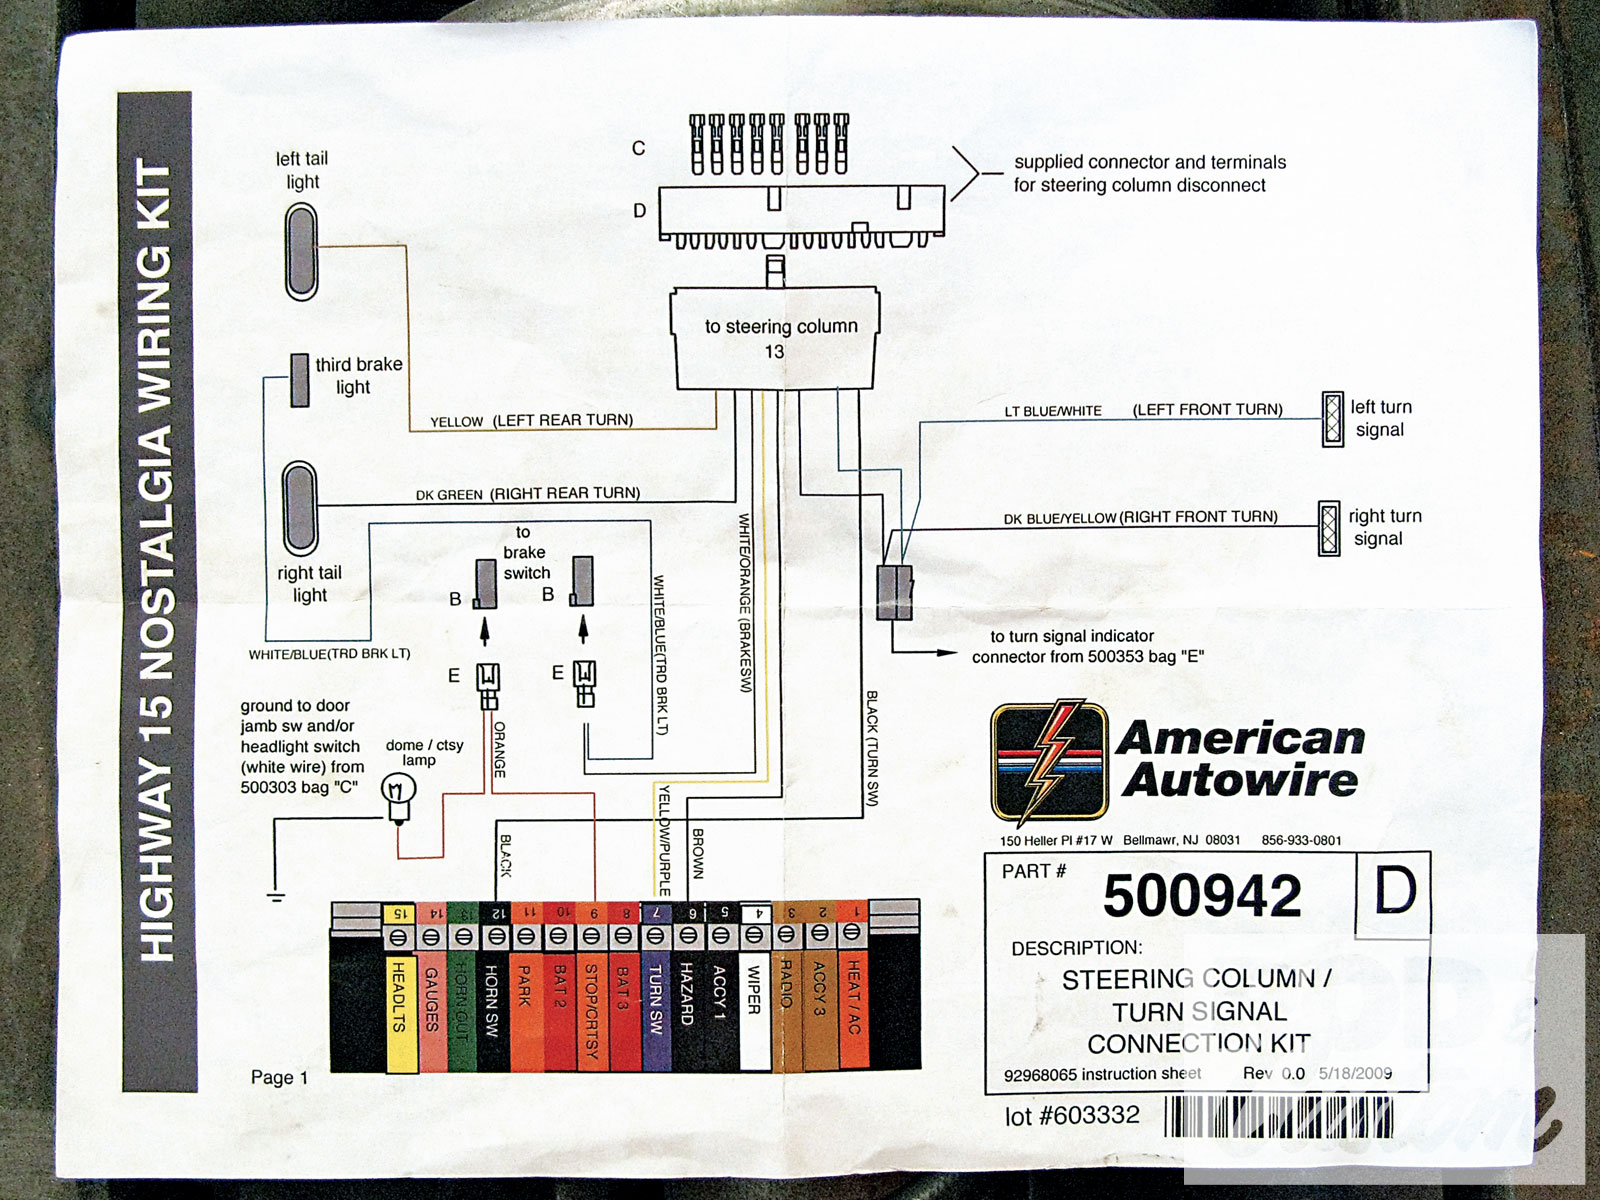 70 Challenger Dash Wiring Diagram Data Diagrams 1970 Duster 73 Cuda Elsavadorla Chevelle